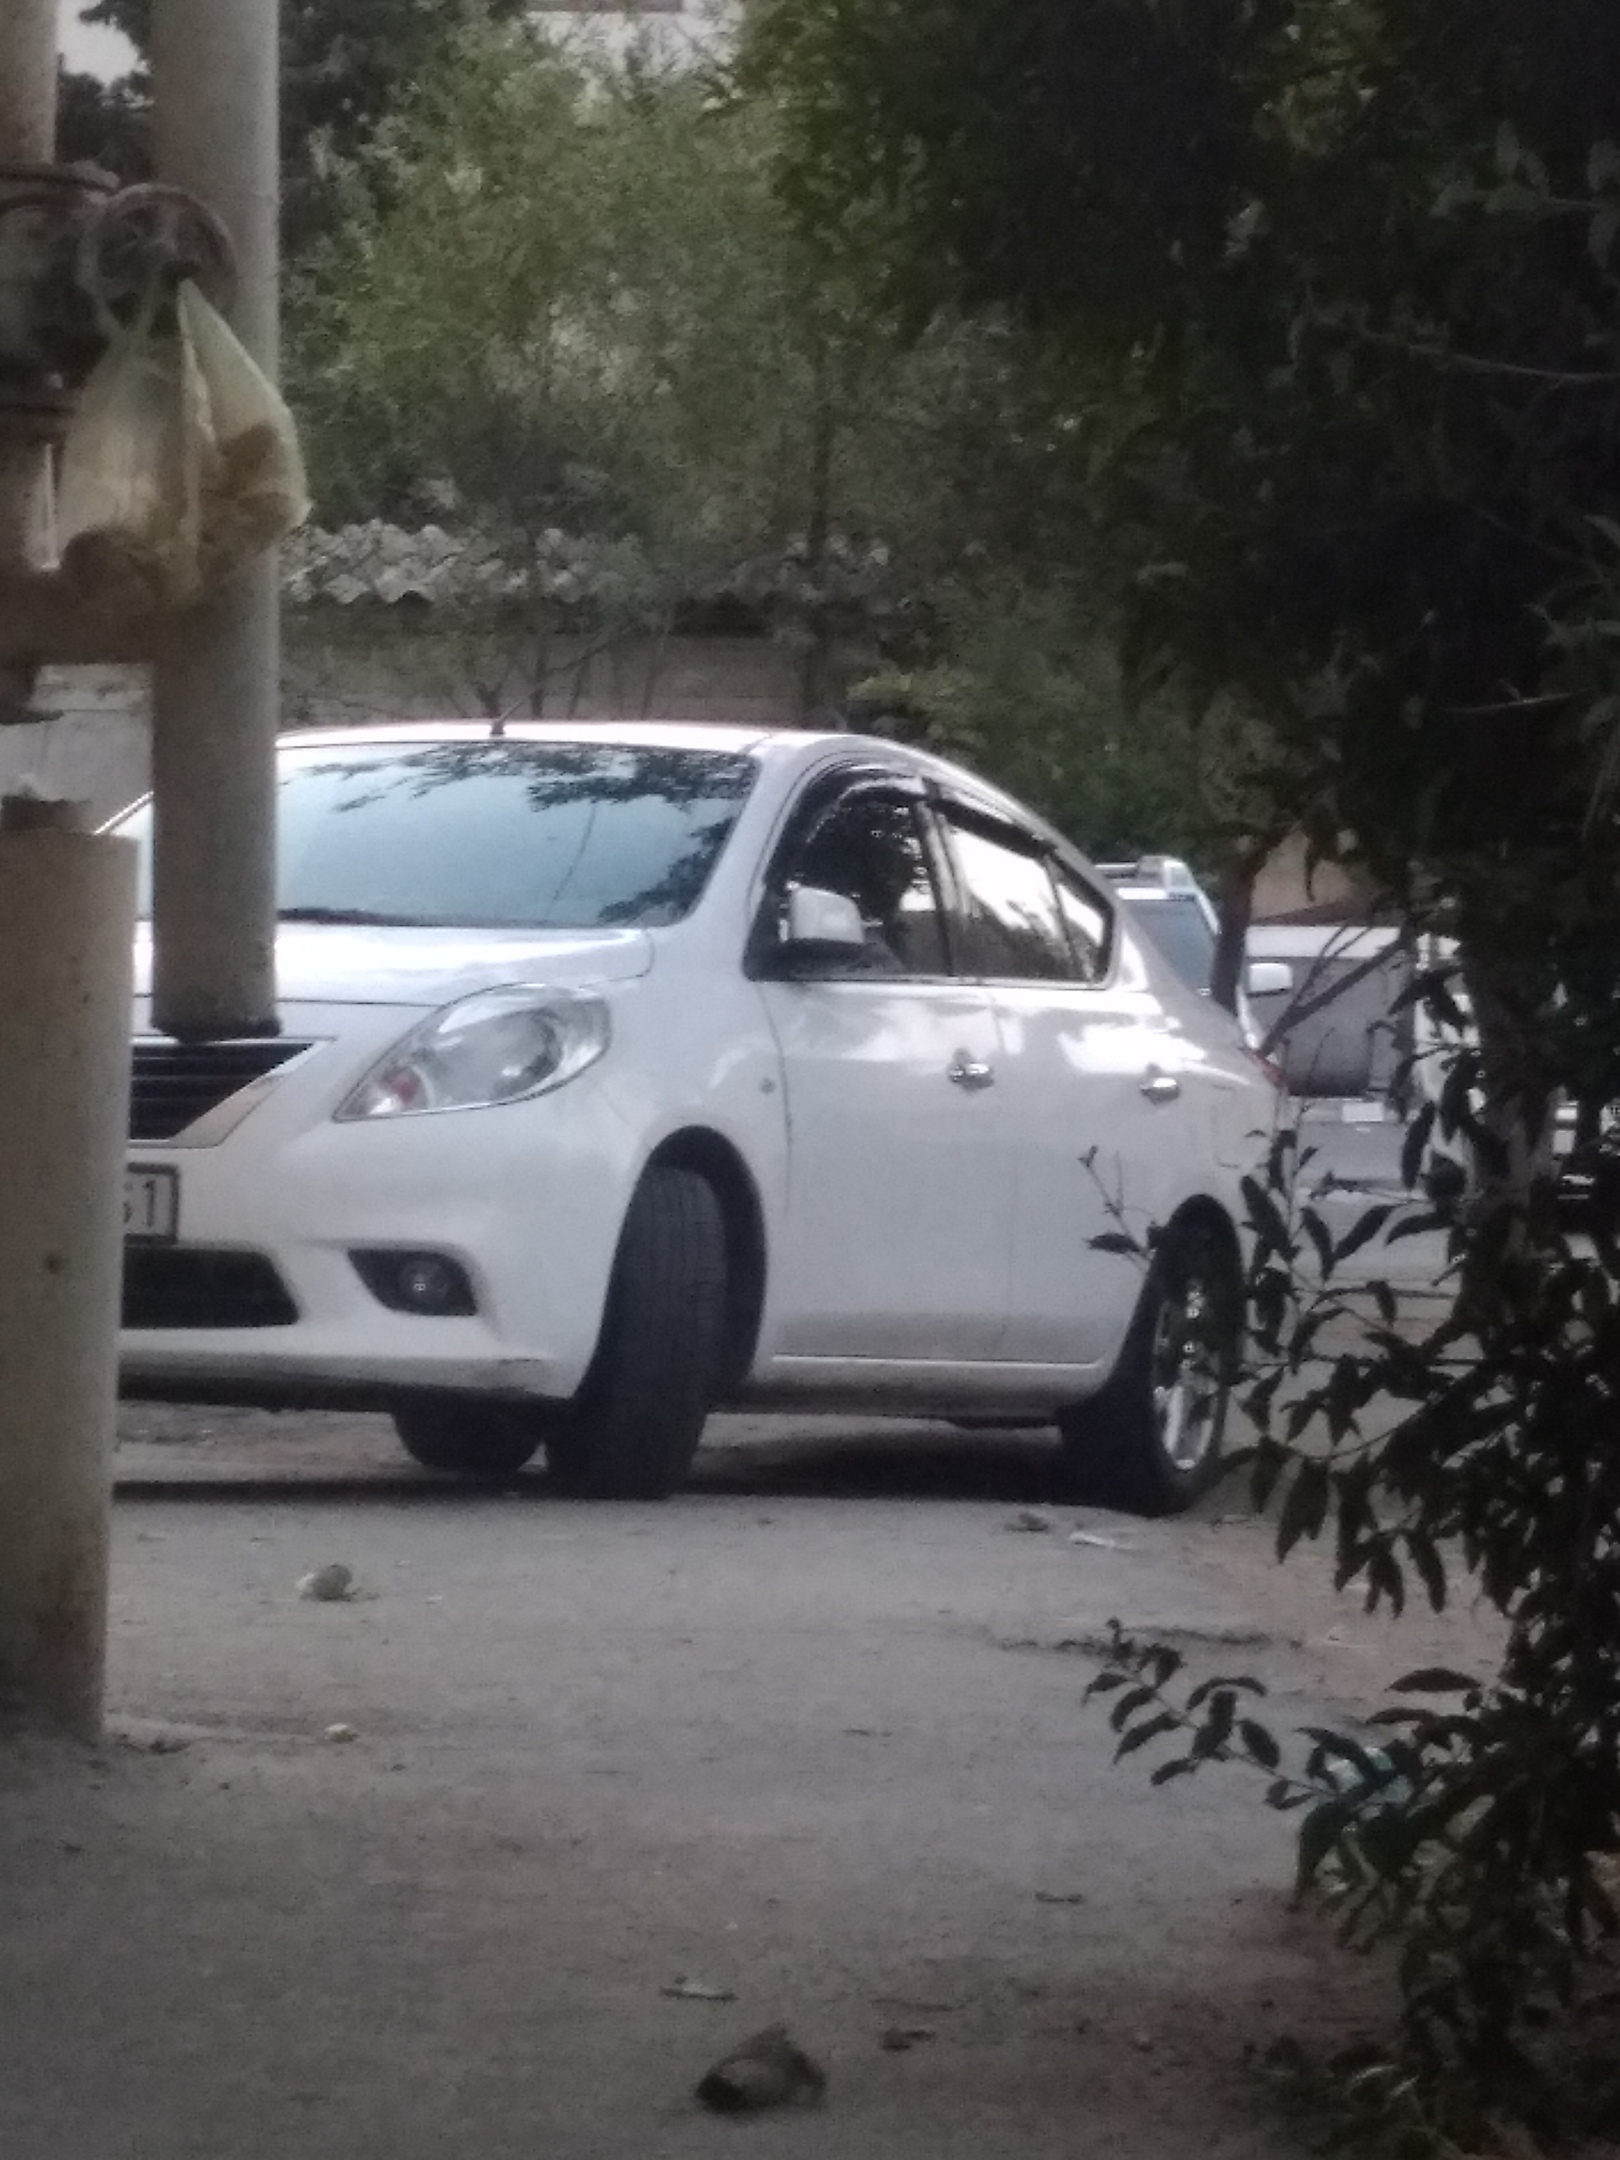 Nissan Sunny 1.5(lt) 2012 İkinci əl  $10000